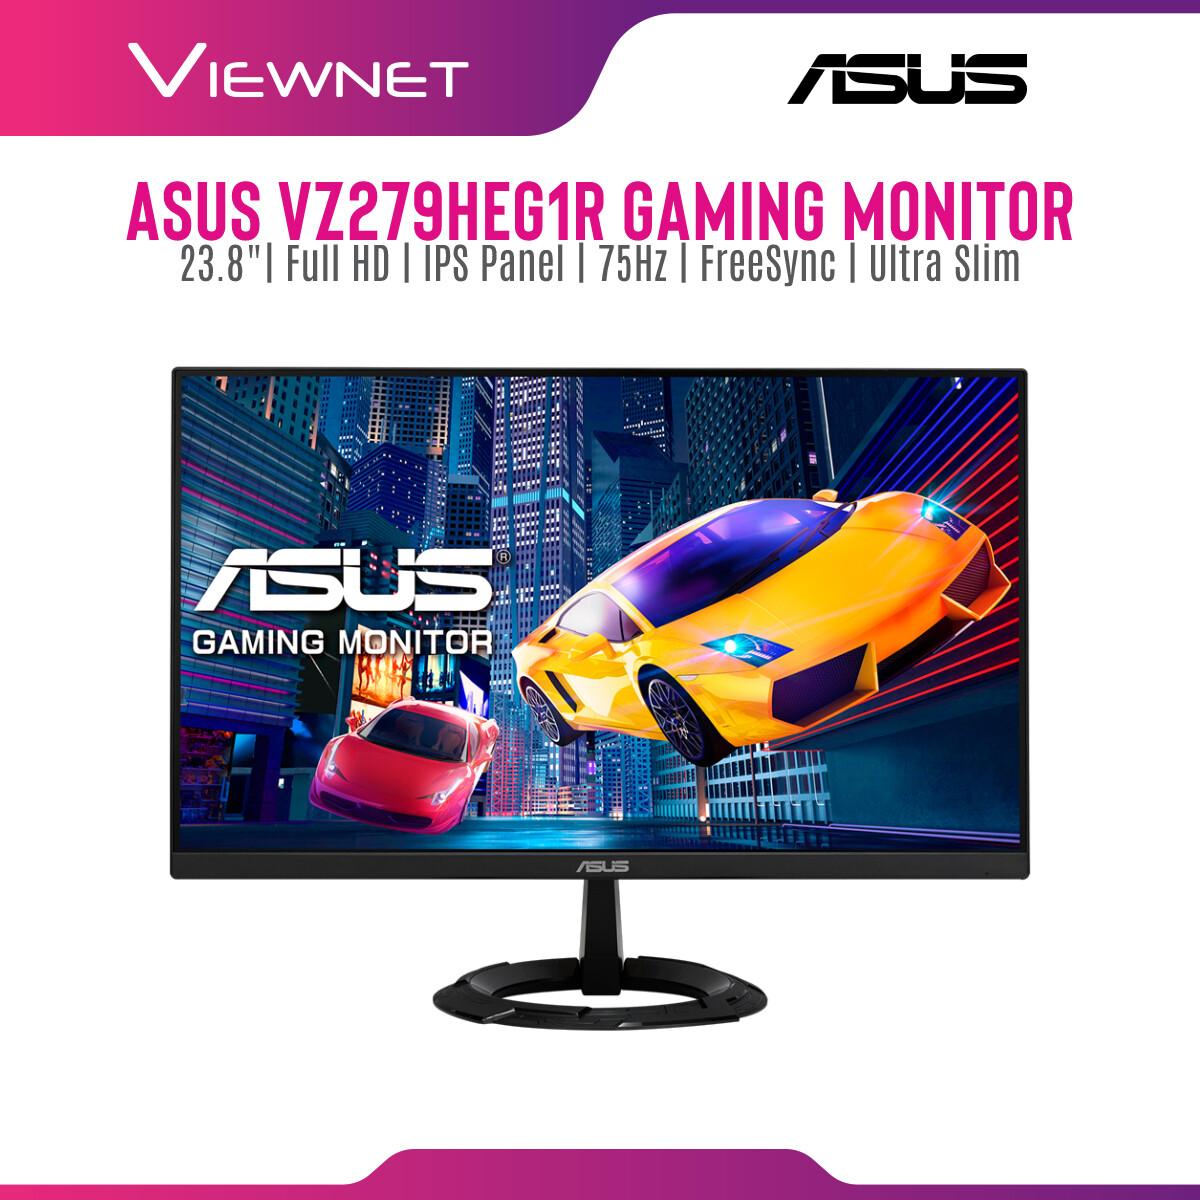 ASUS VZ249HEG1R / VZ279HEG1R Gaming Monitor, Full HD, IPS, 75Hz, 1ms MPRT, Extreme Low Motion Blur, FreeSync, Ultra-slim